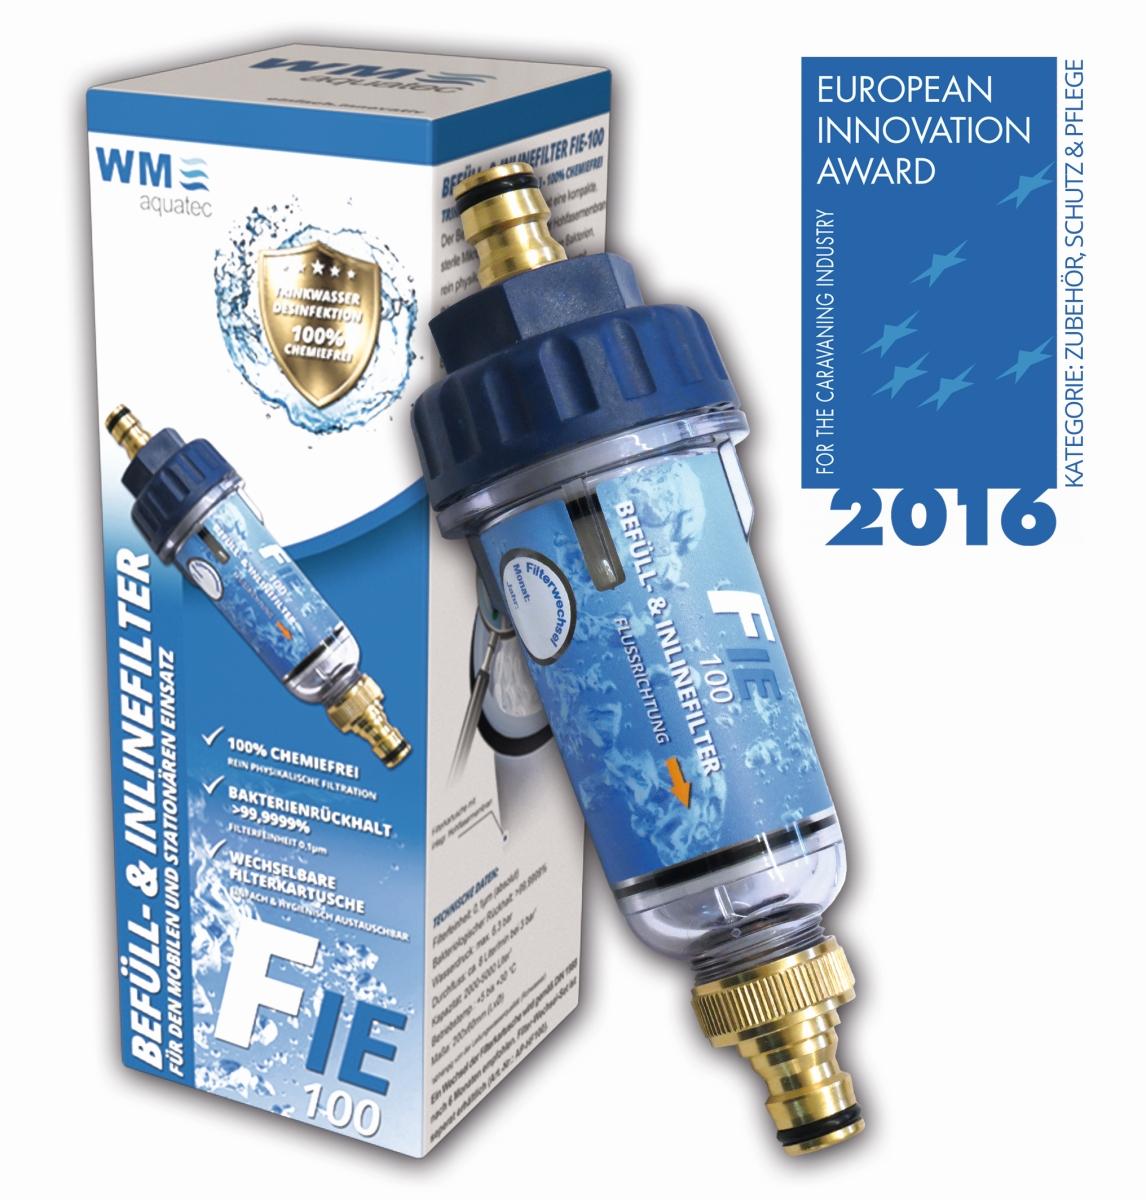 WM aquatec Befüll- und Inlinefilter FIE-100